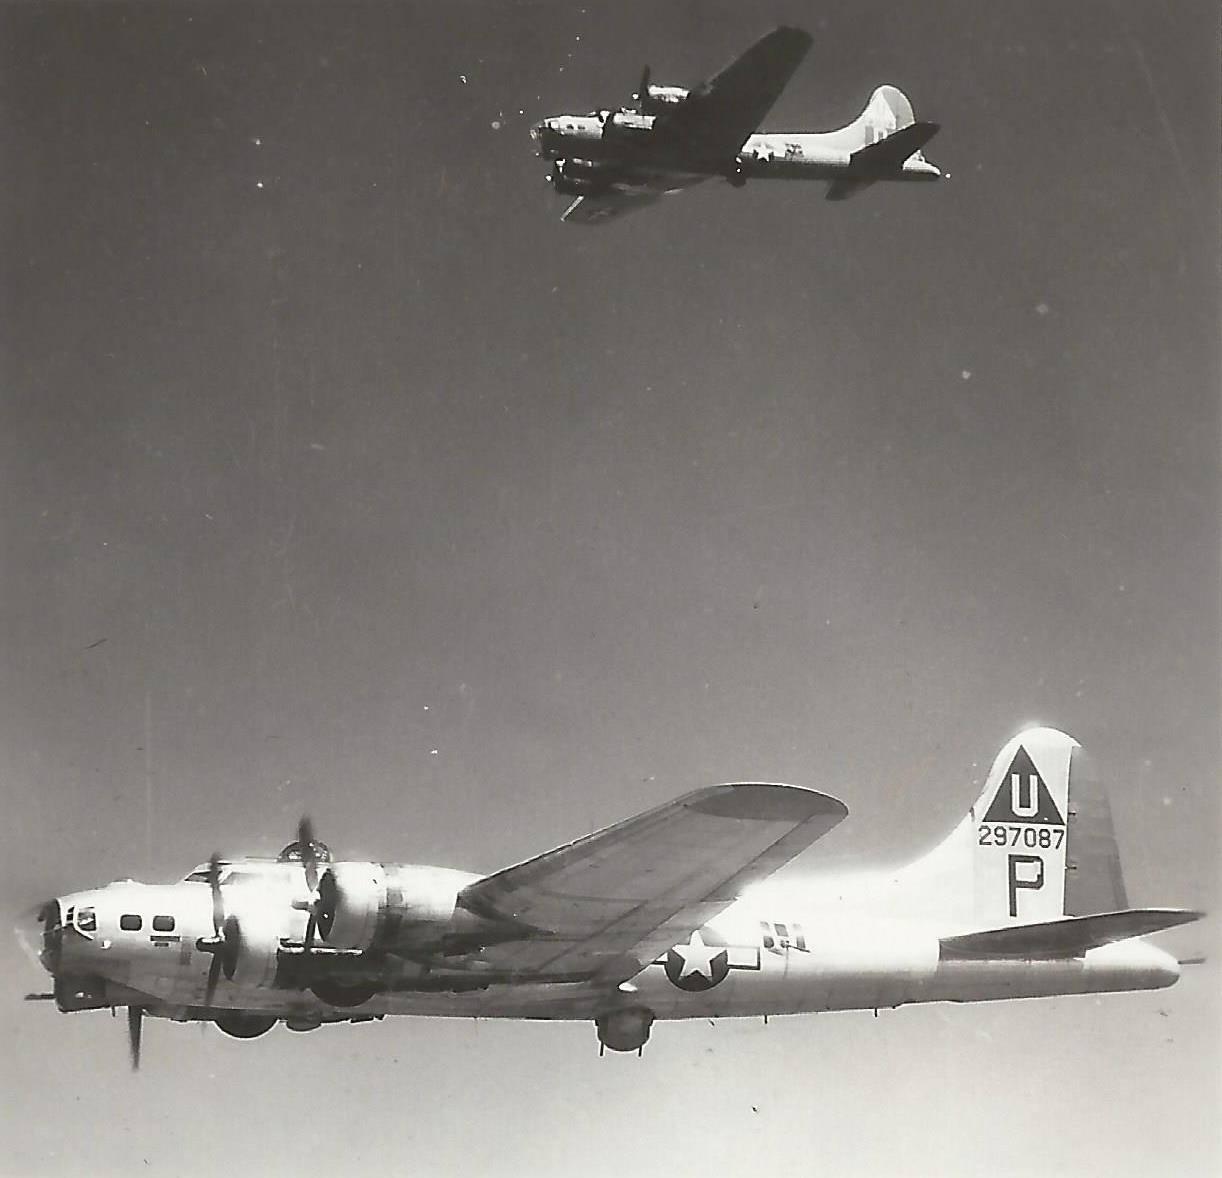 B-17 #42-97087 / Tujunga!